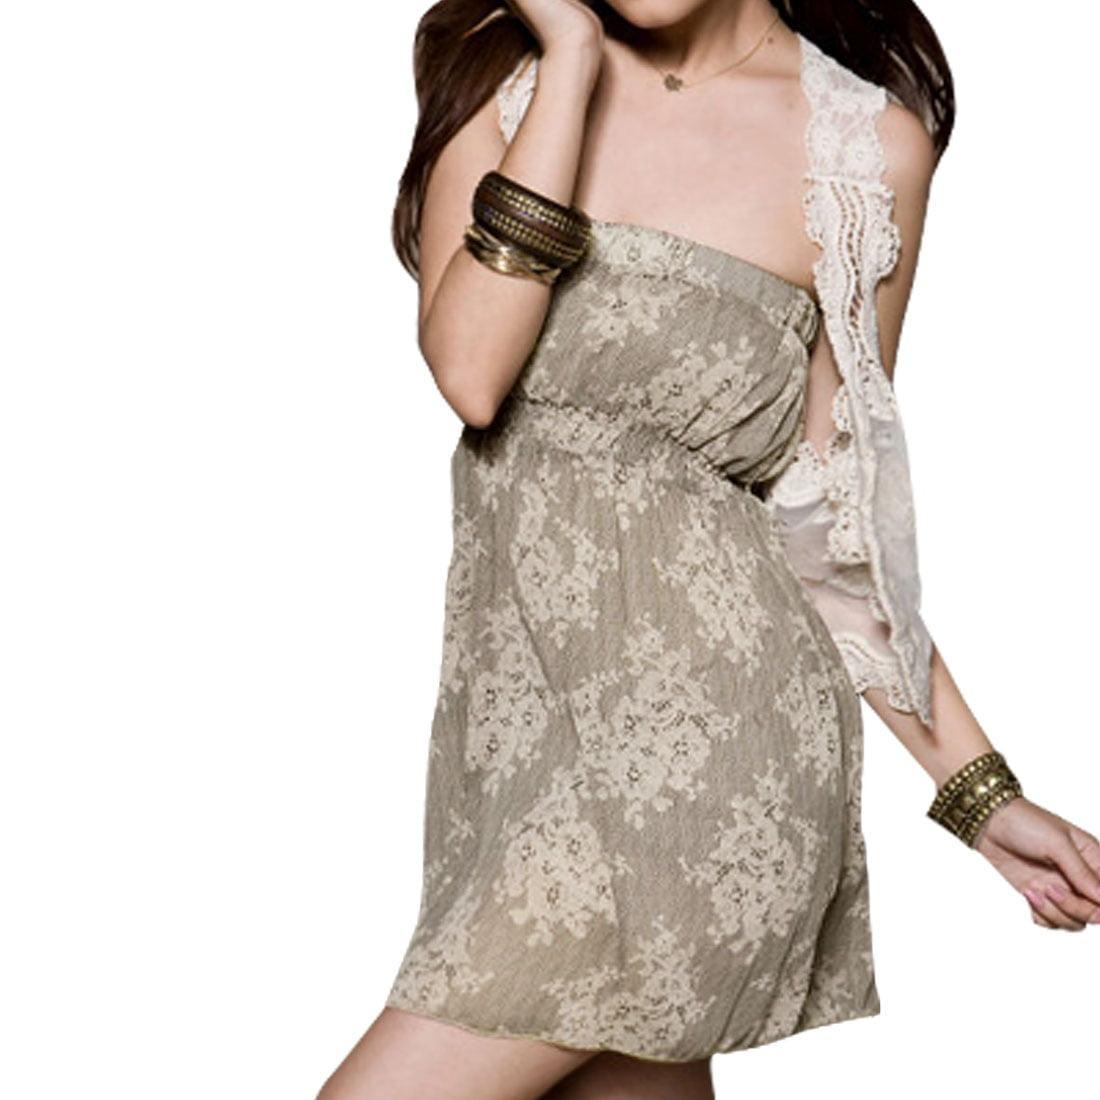 Unique Bargains Girl US L Chiffon Inner Lining Off Shoulder Tube Dress - image 1 de 1